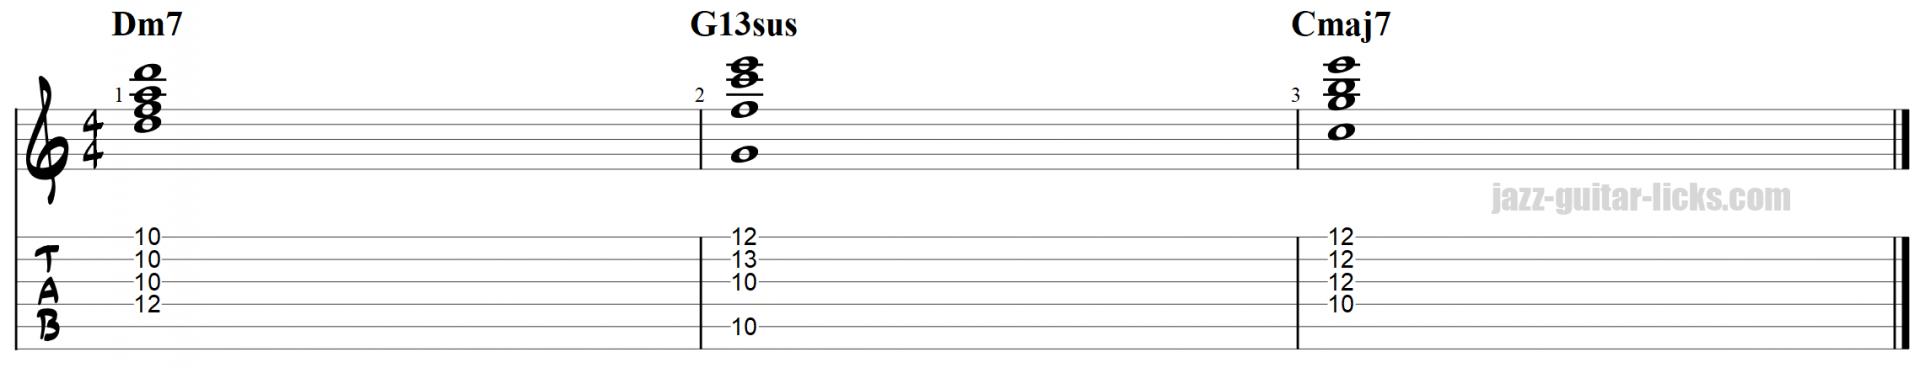 Suspended chords over 2 5 1 progression 3 1